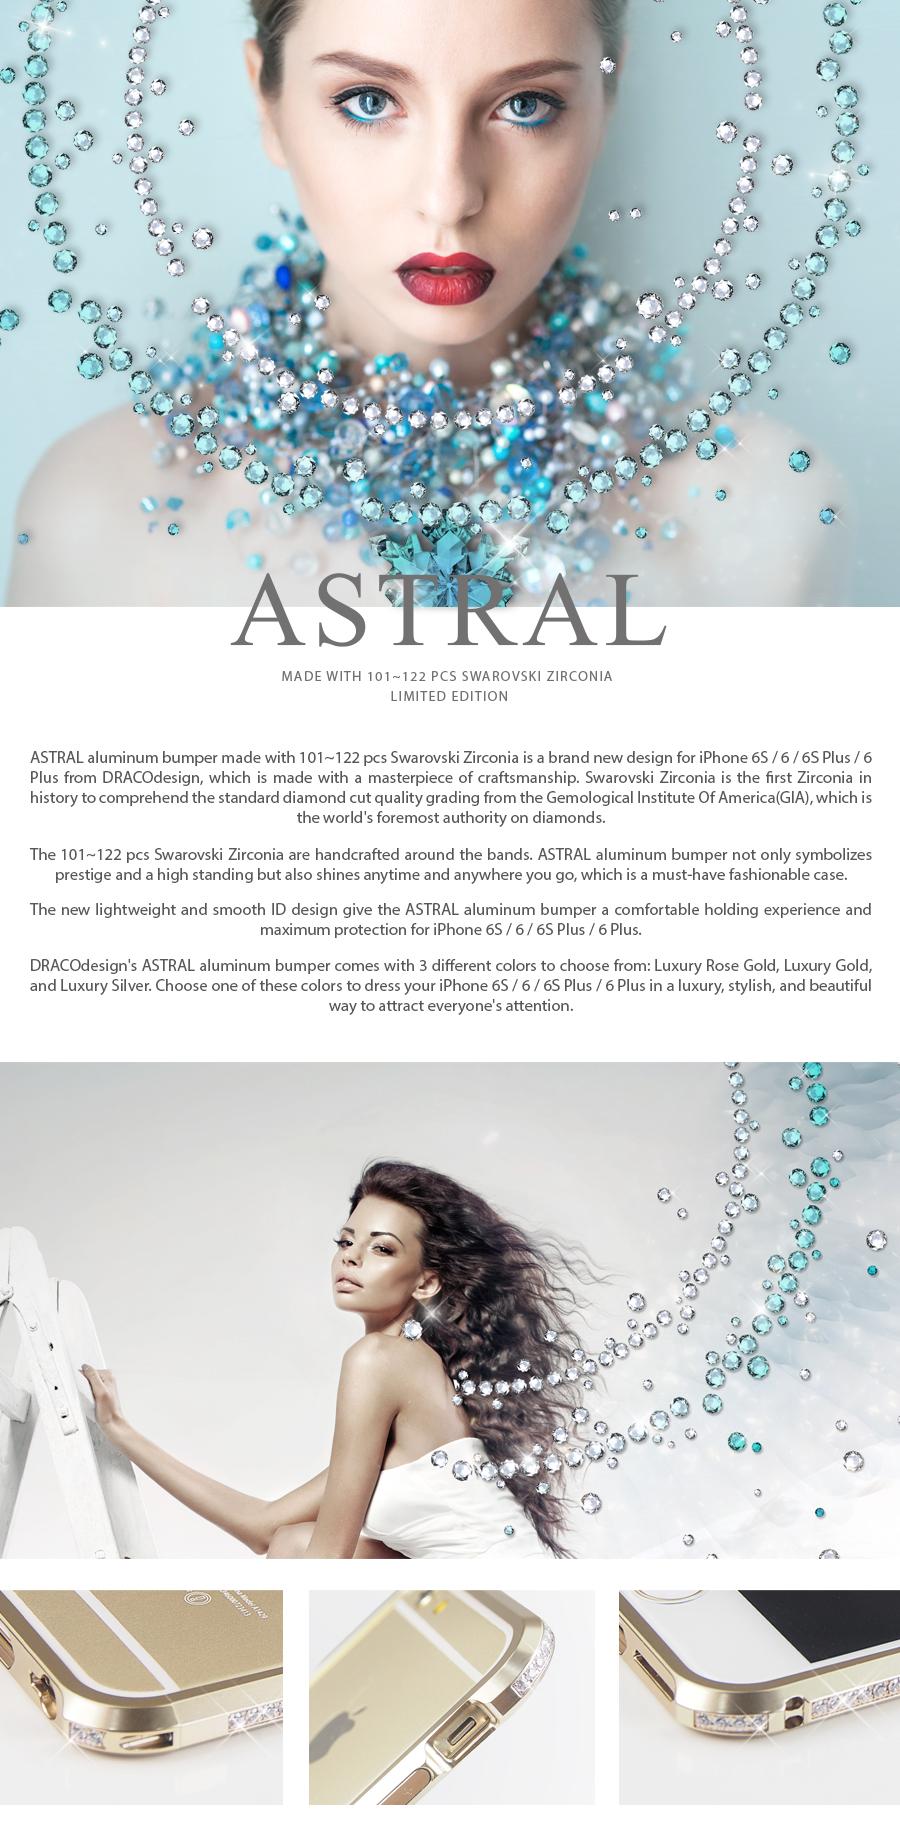 astral1.jpg